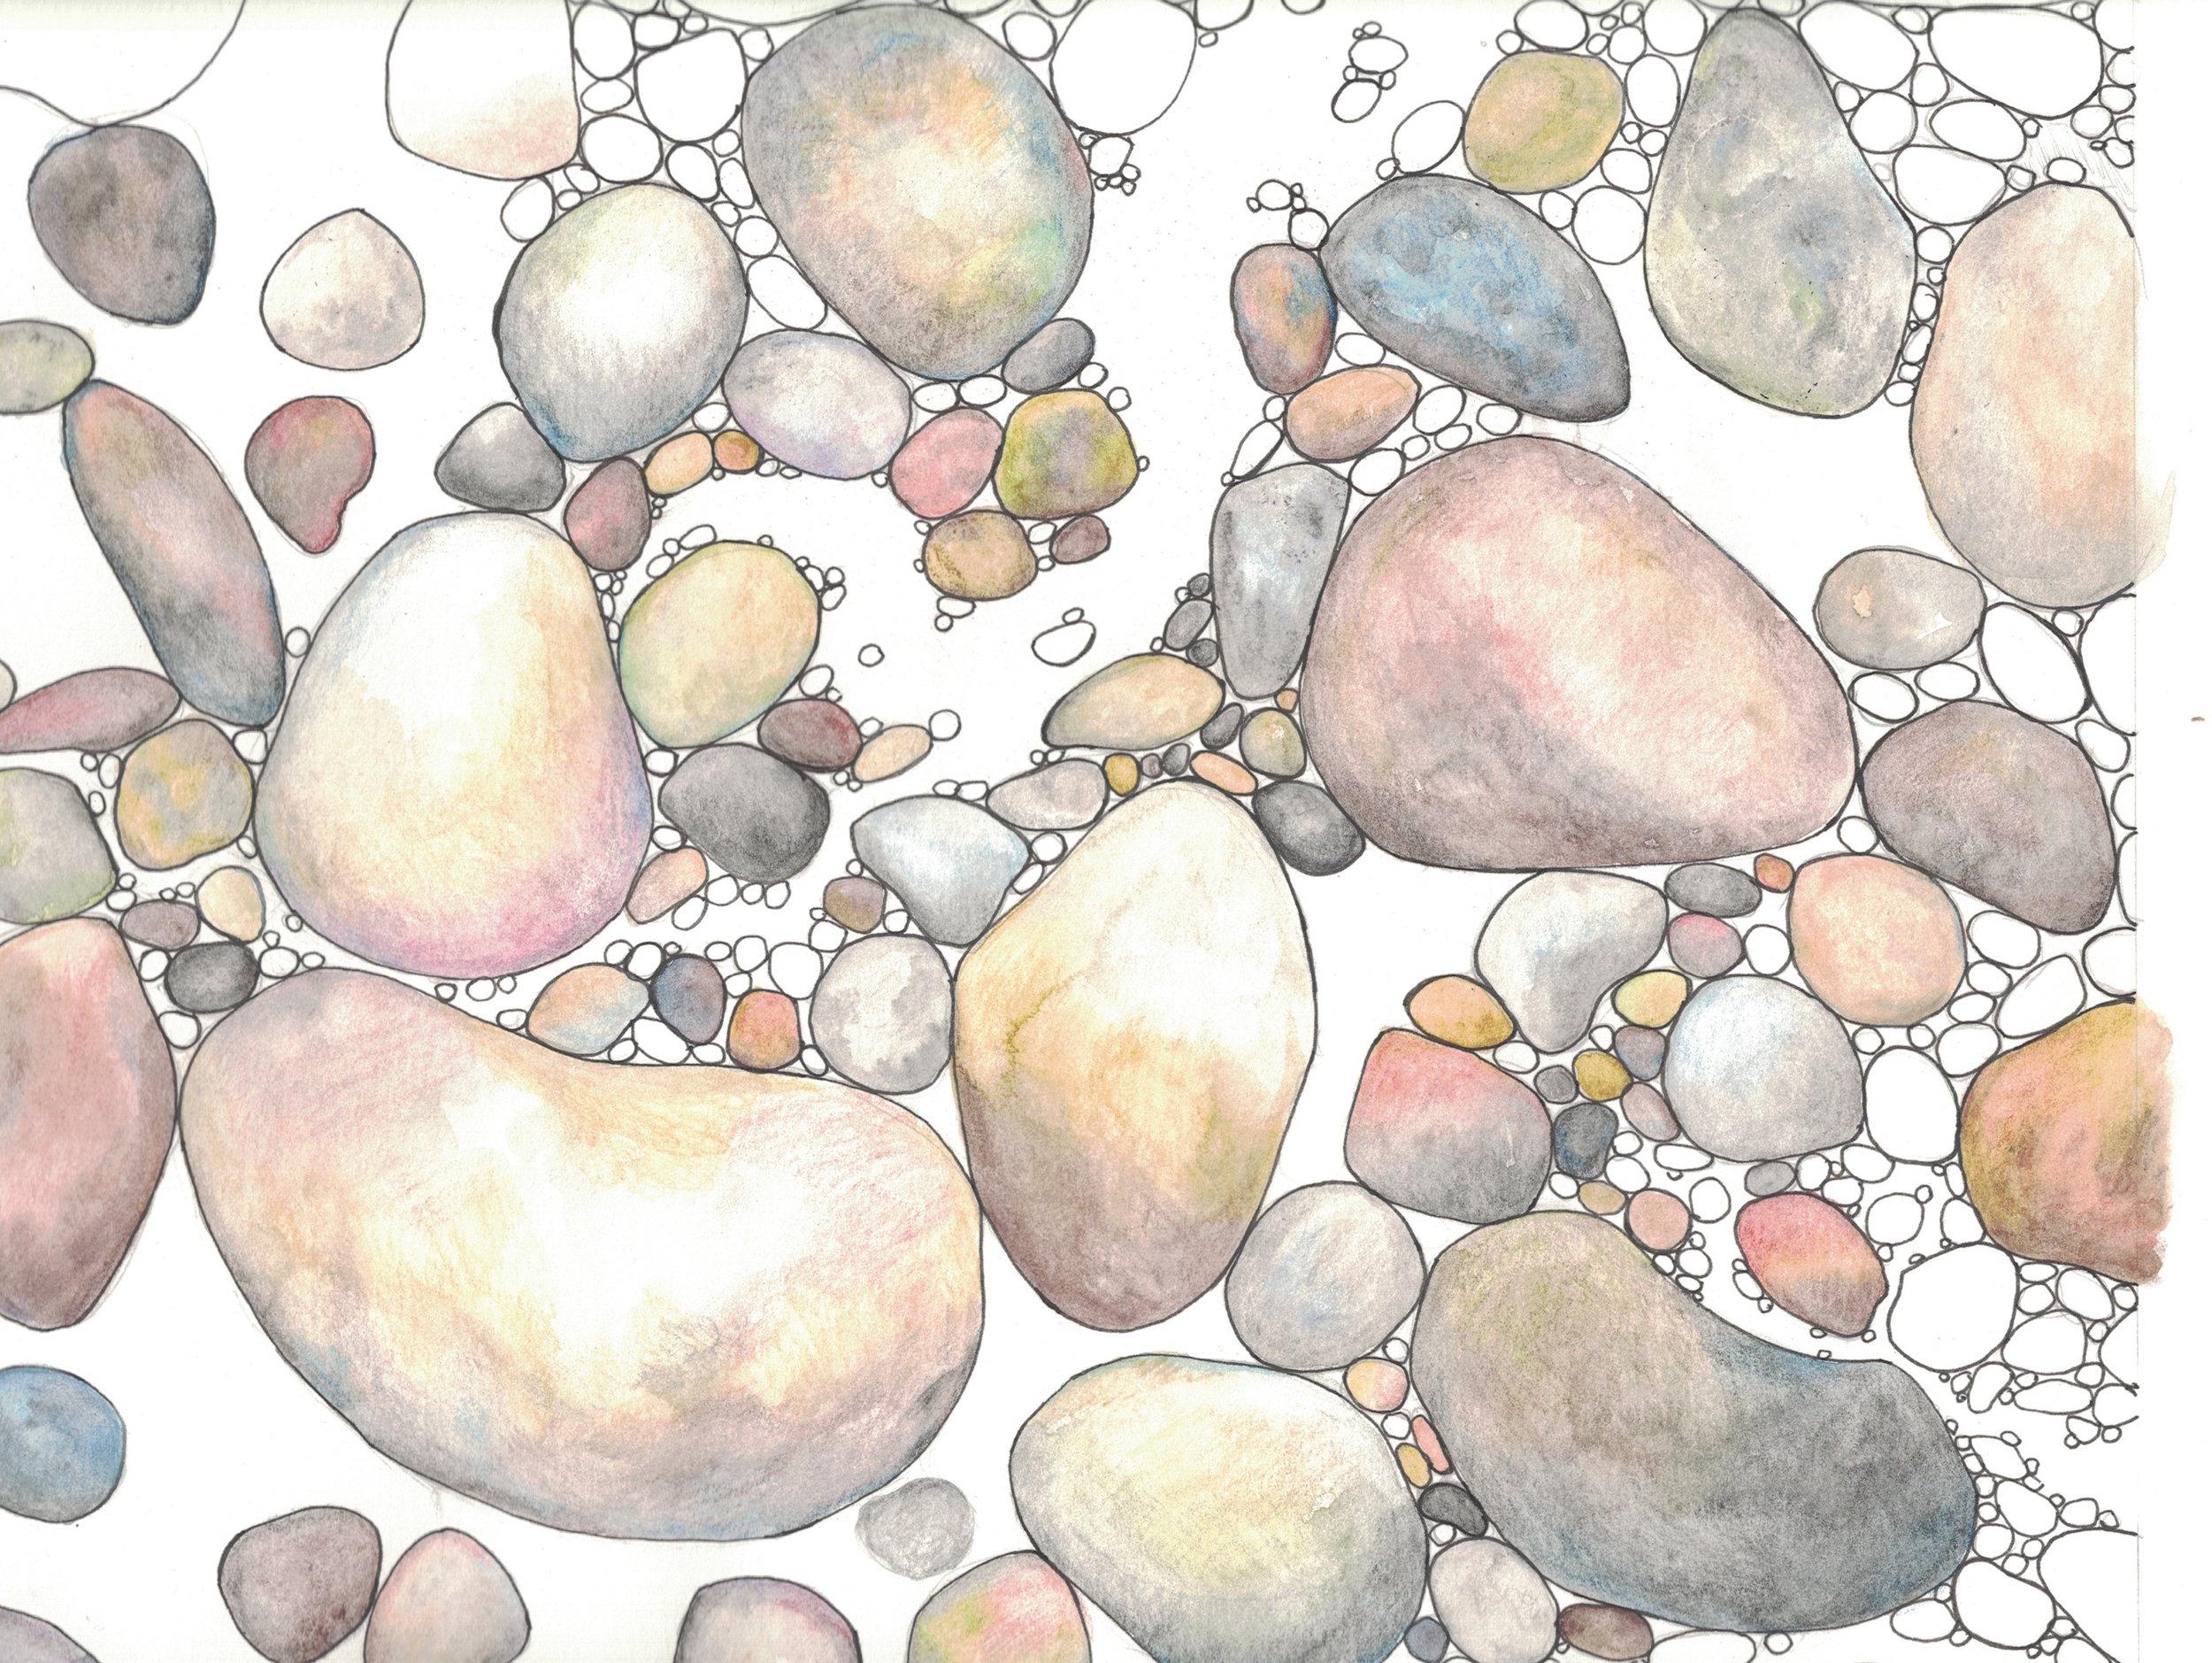 stony run 1.jpg